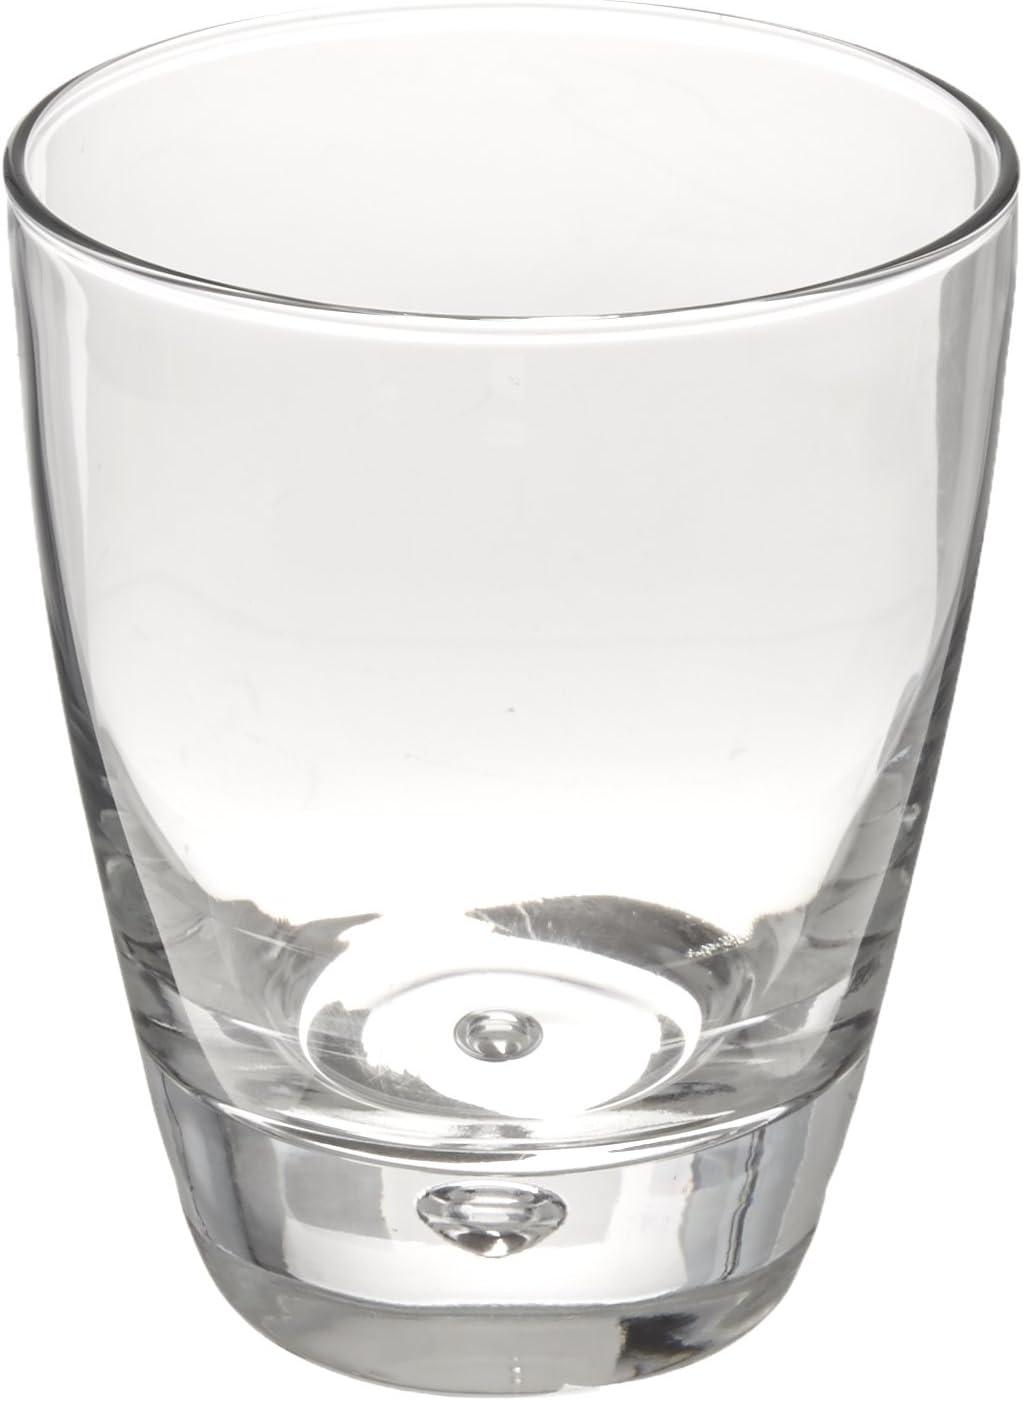 Bormioli Rocco Luna Double Old Fashioned Glasses, Clear, Set of 4